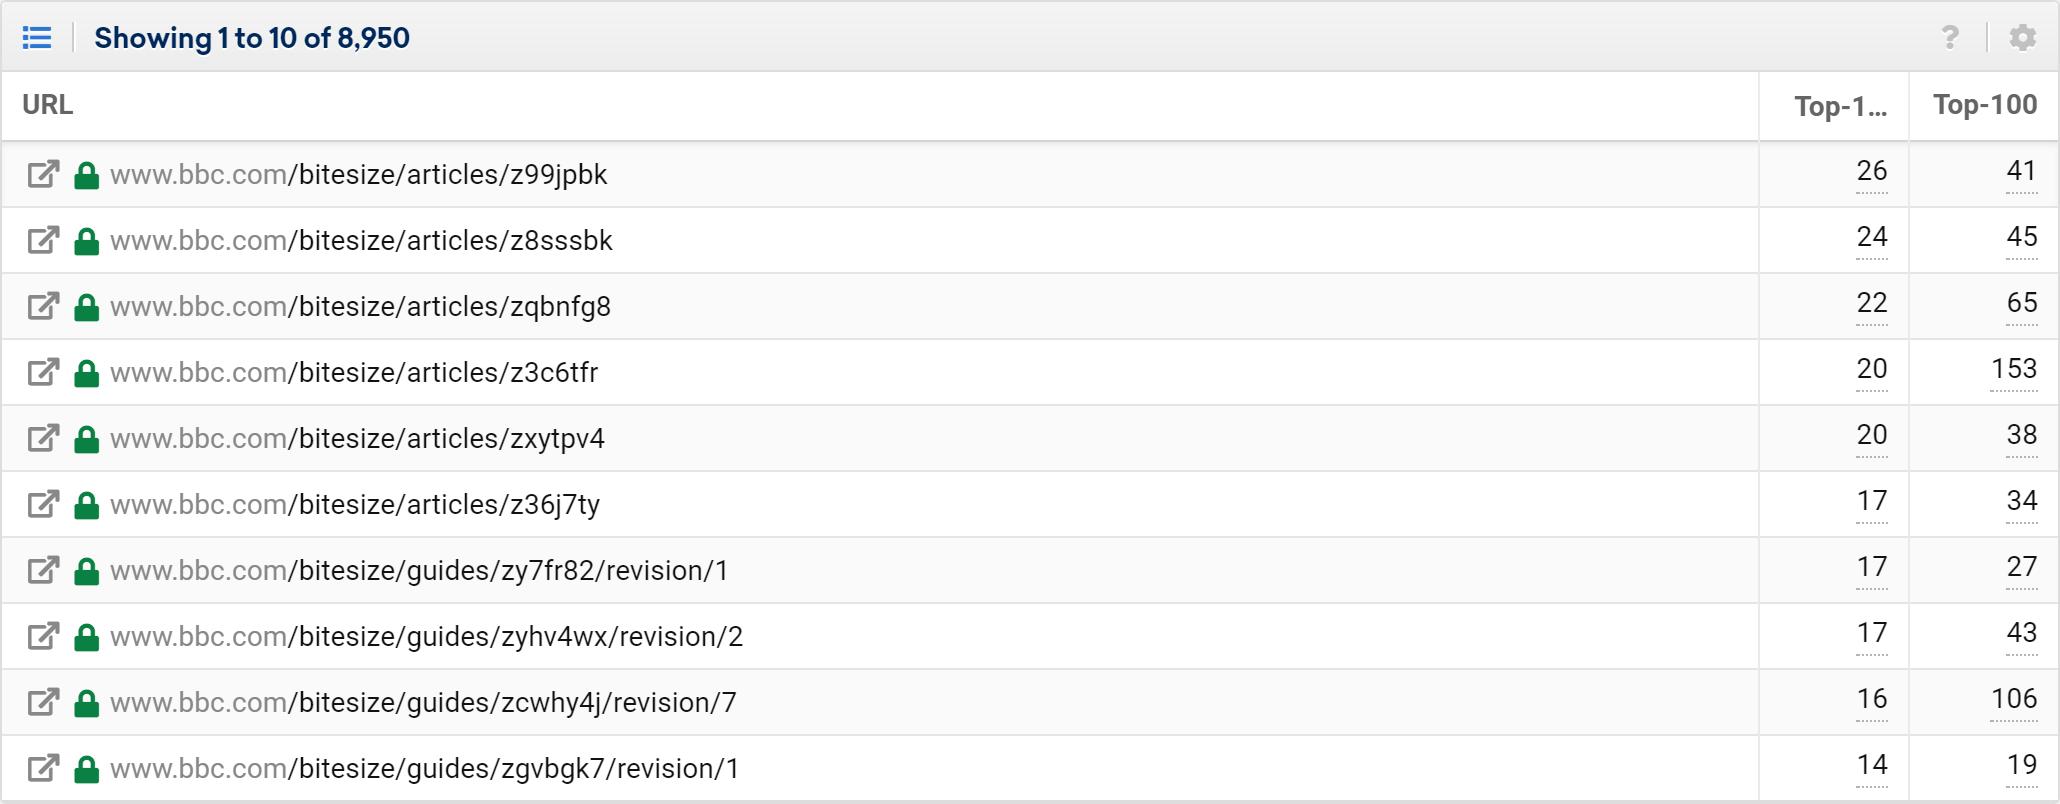 bitesize most ranking URLs